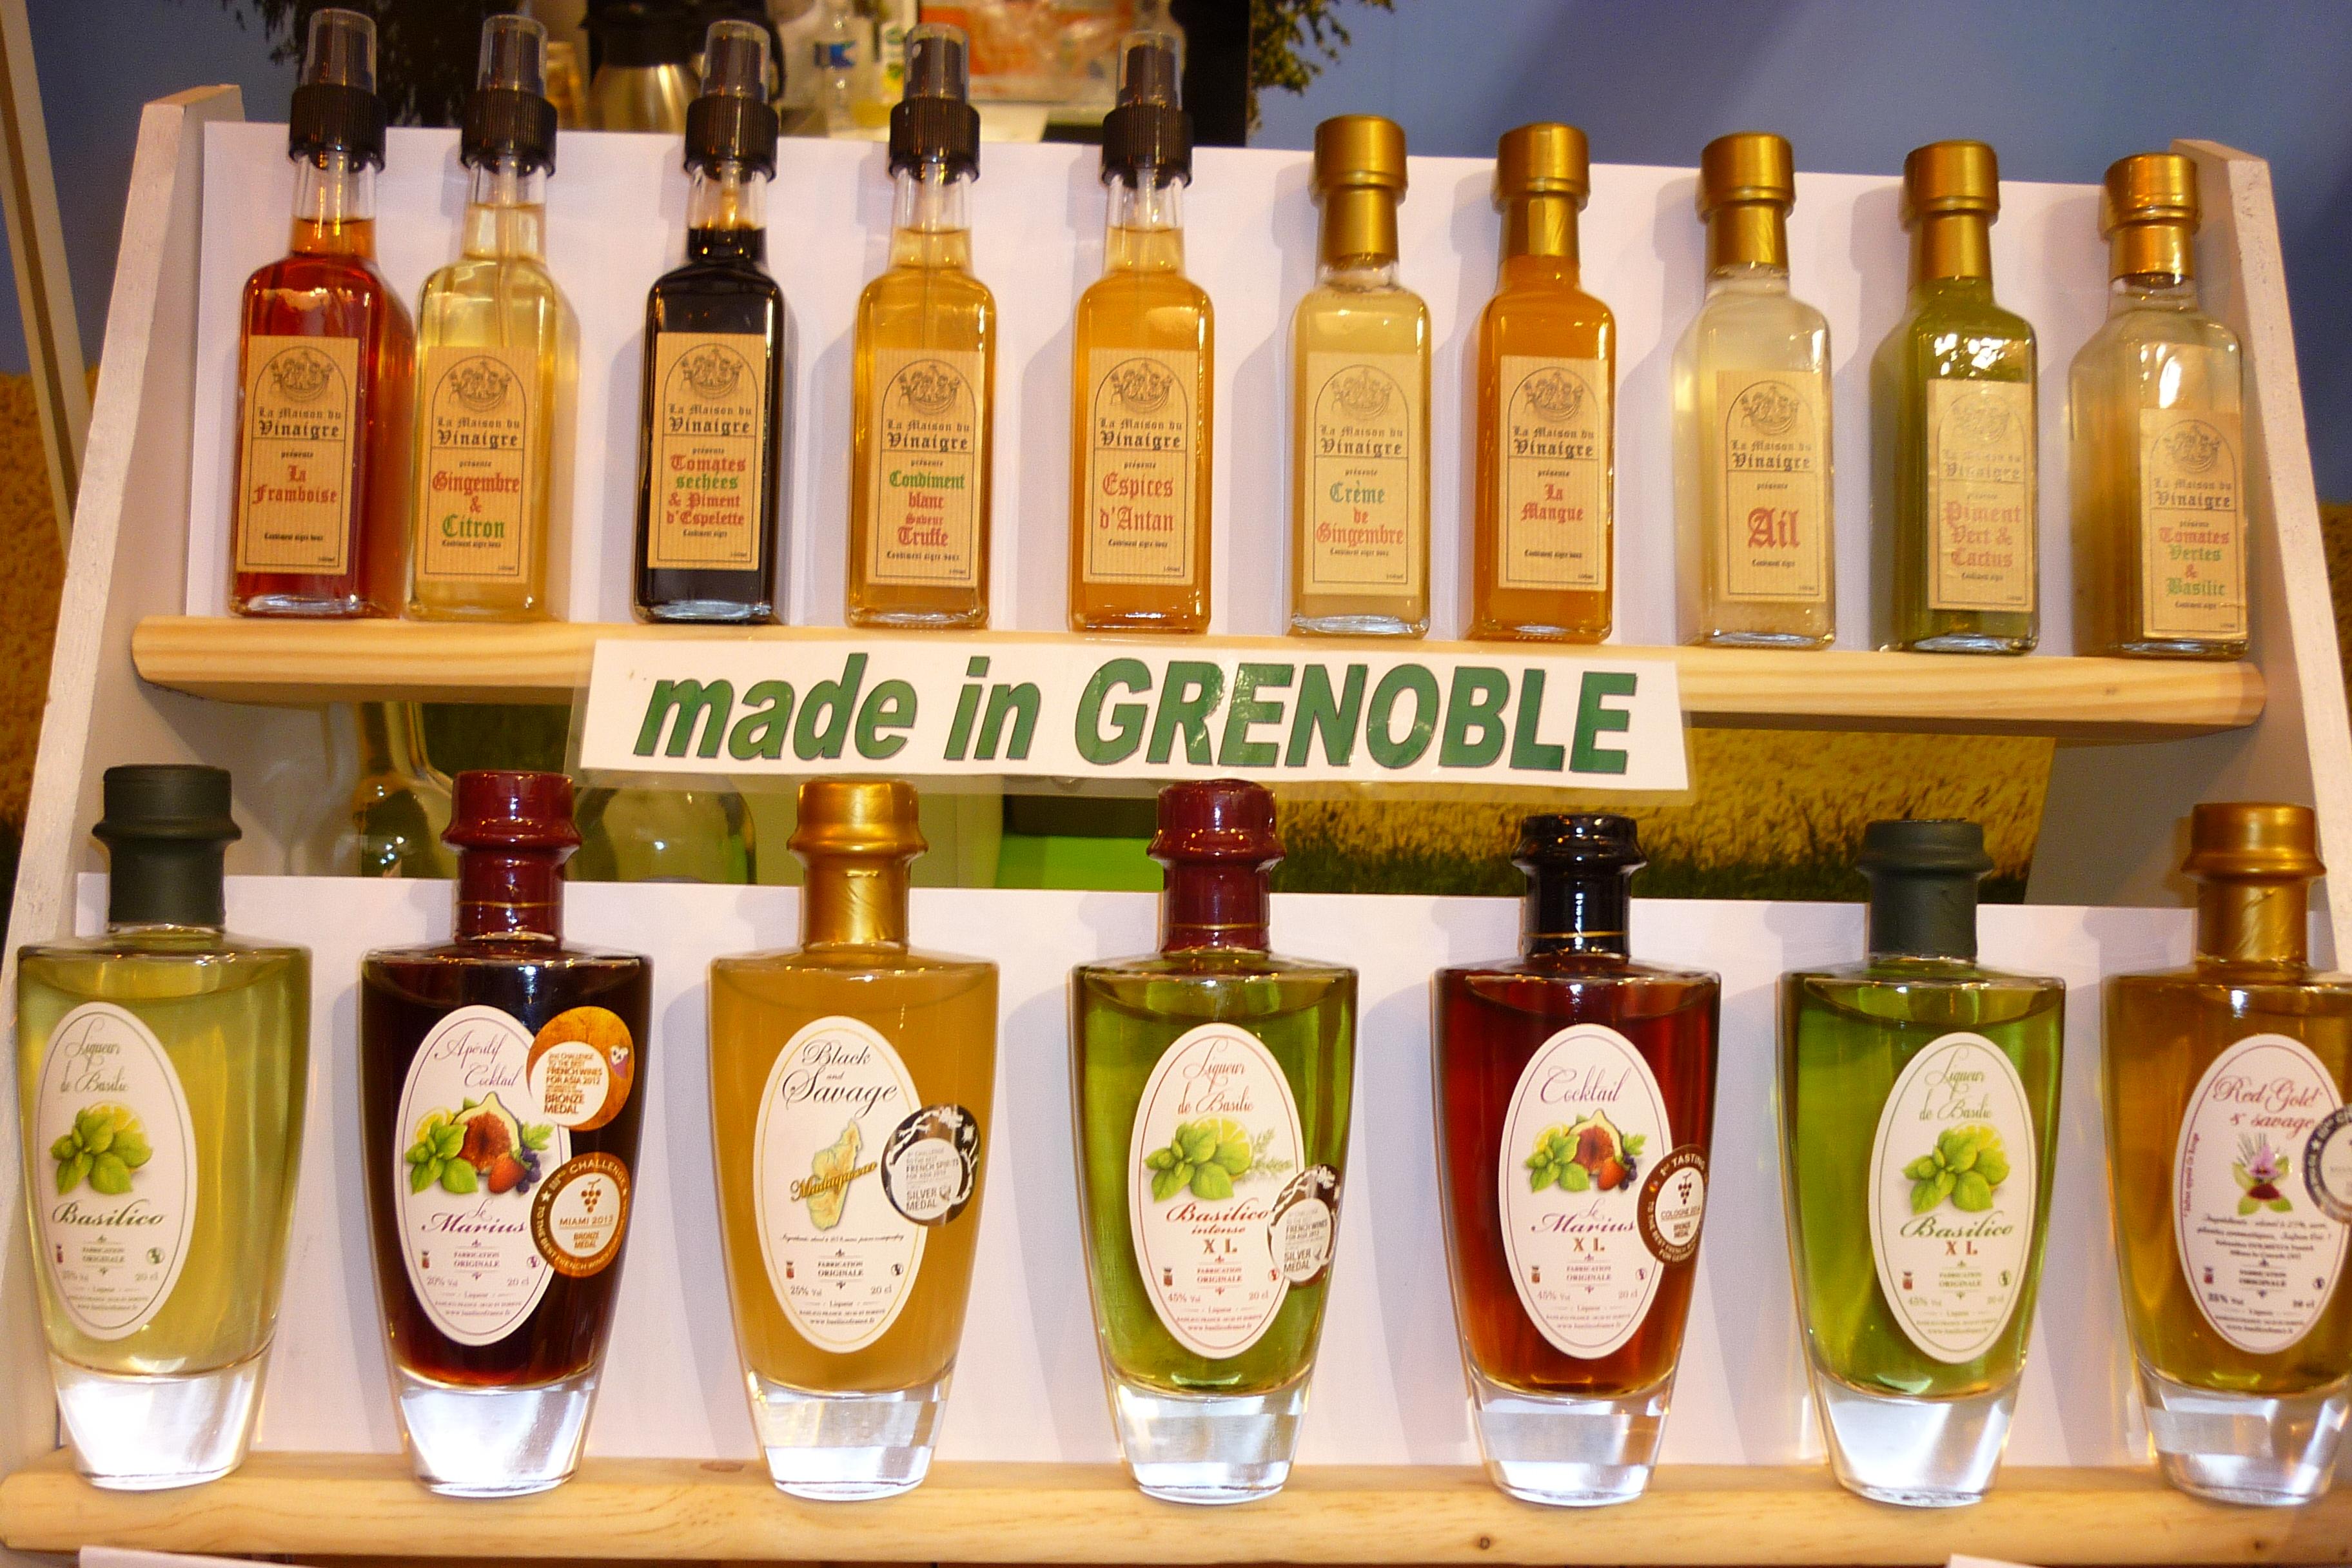 Made in Grenoble